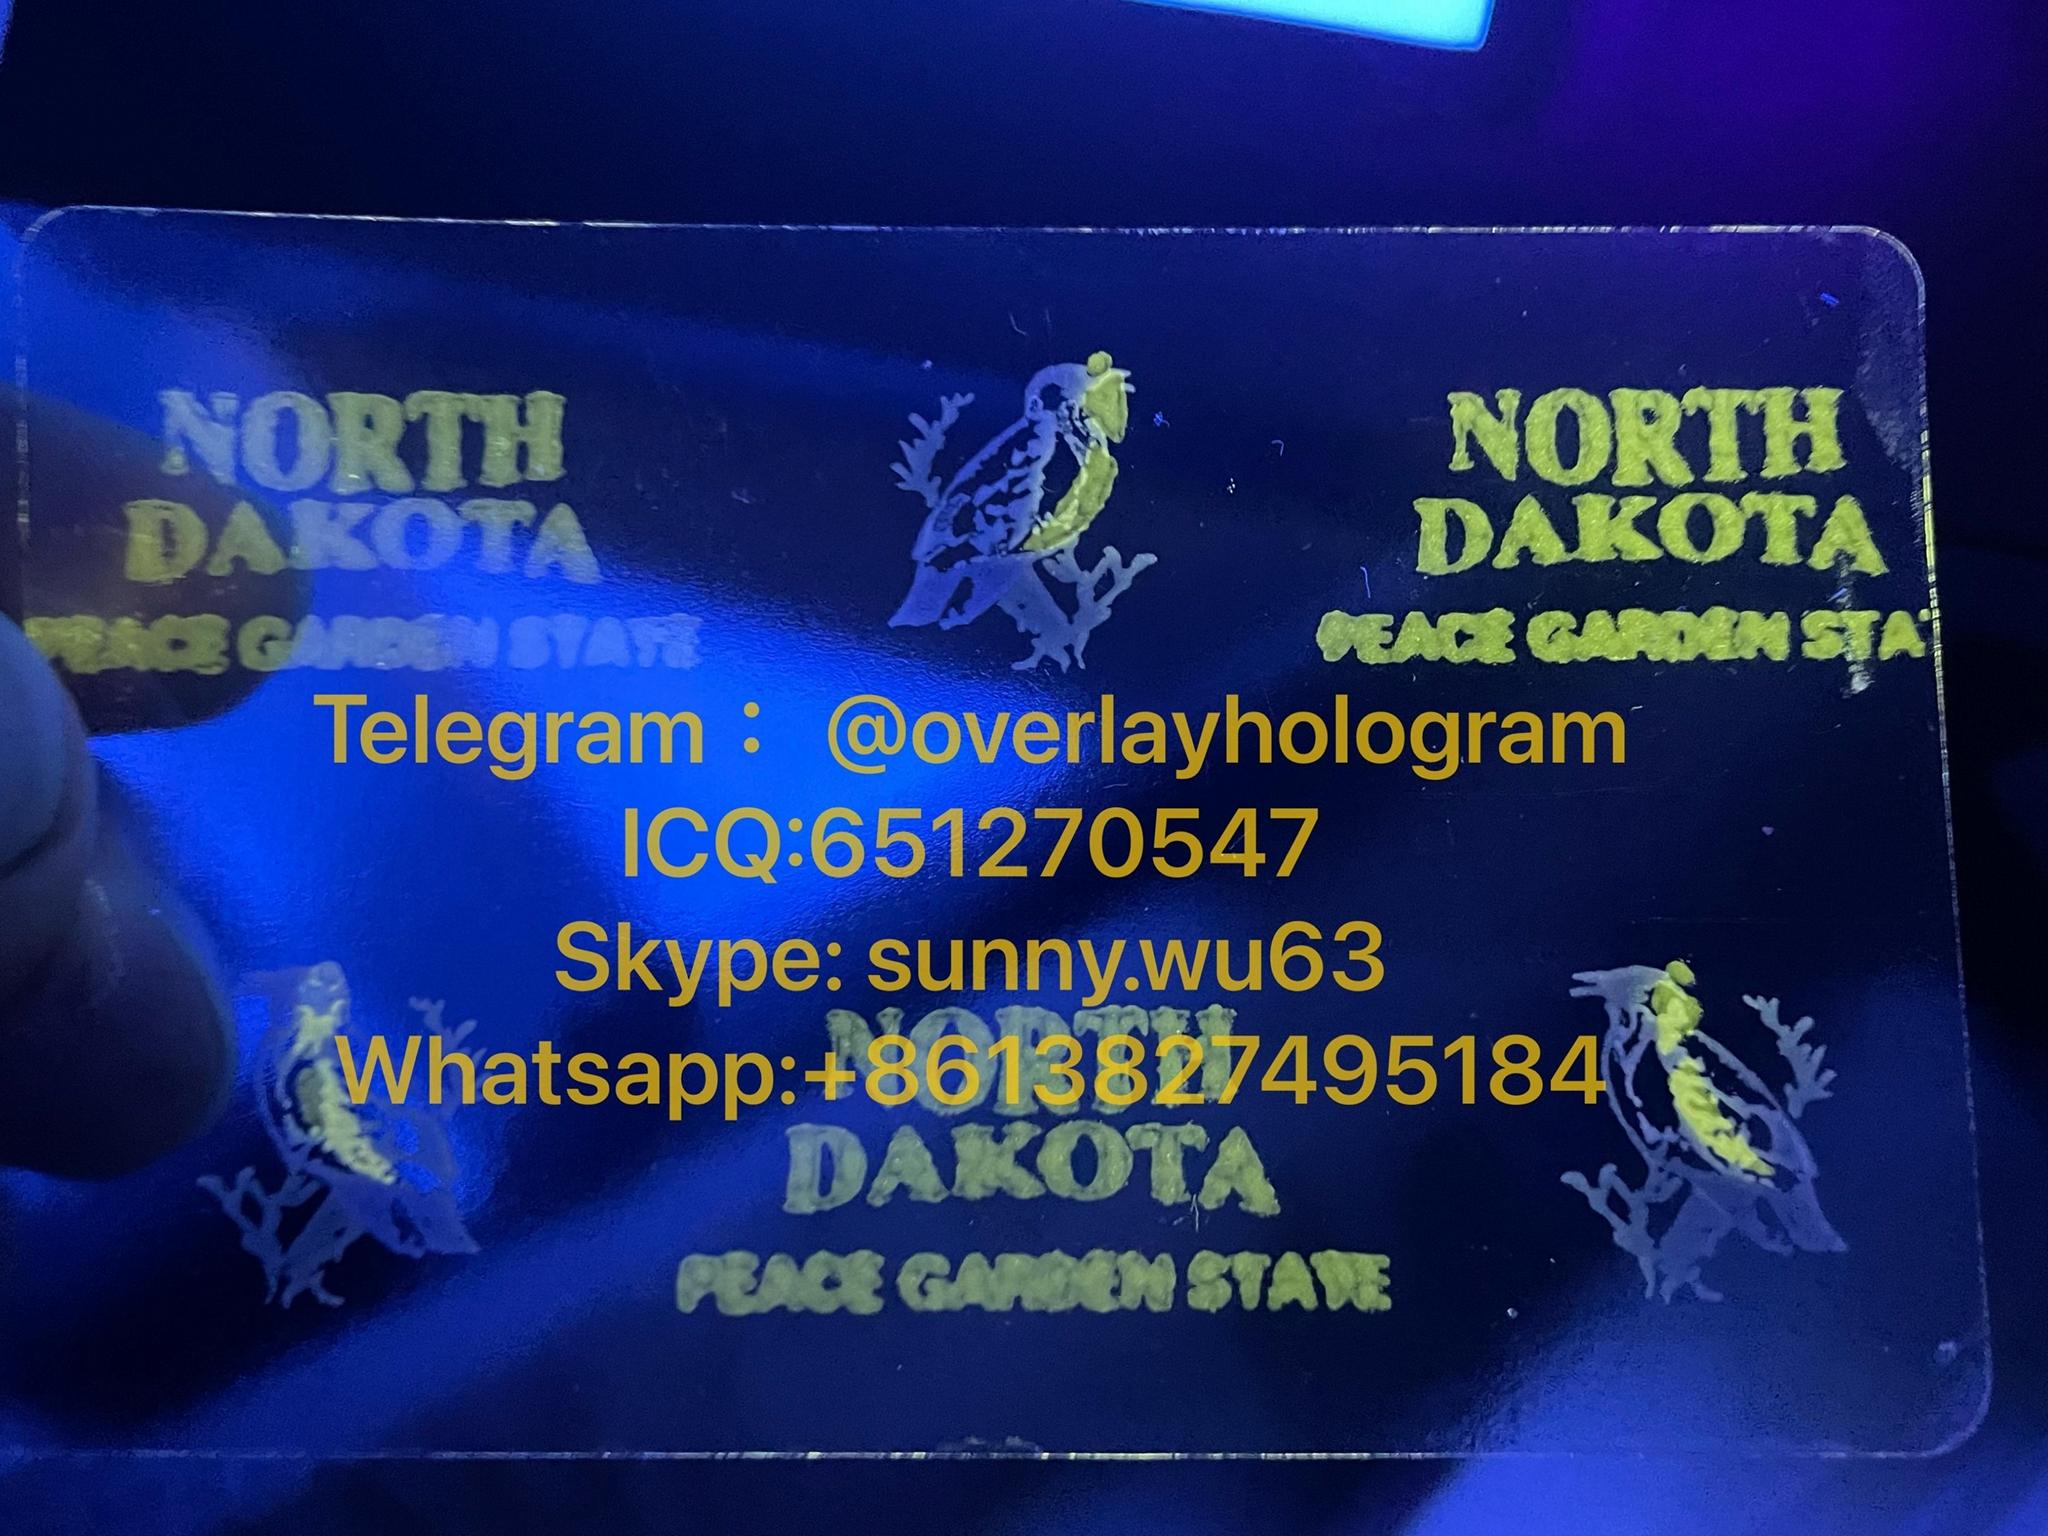 new ND state ID hologram North Dakota state overlay 1